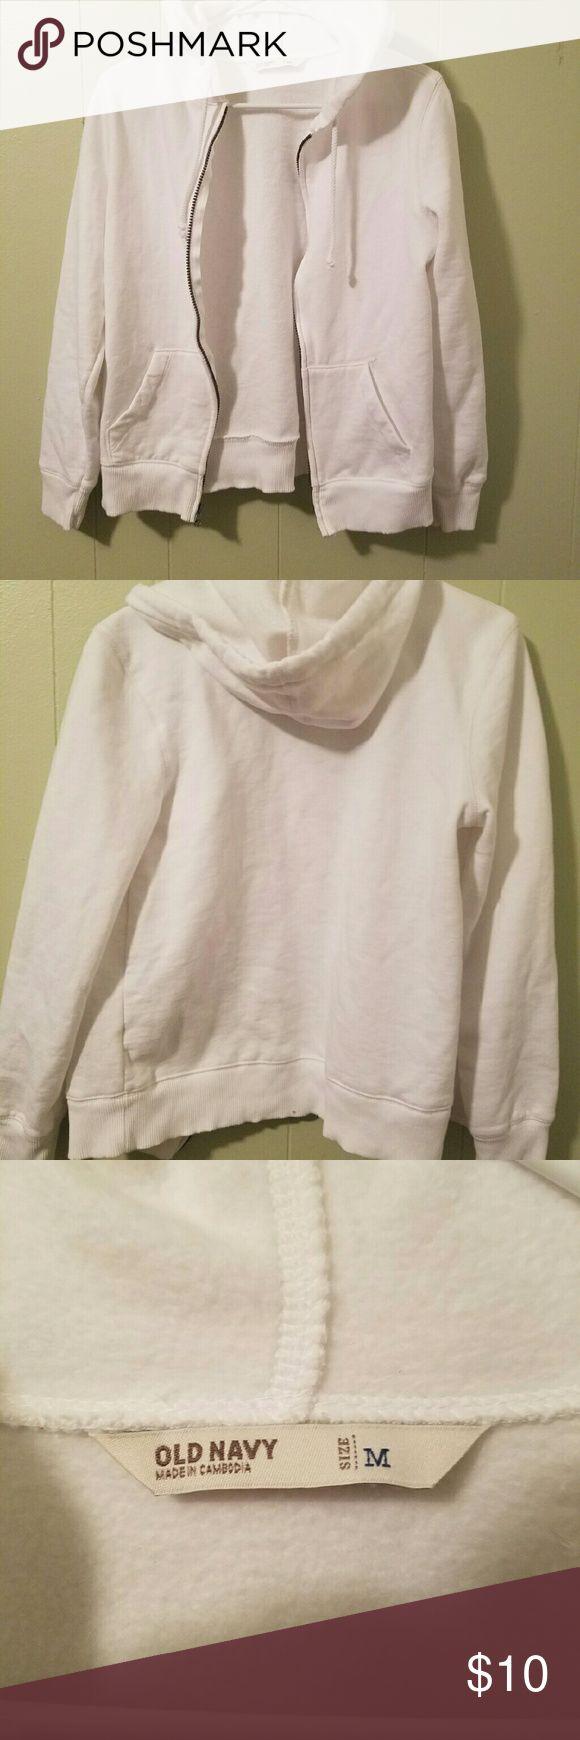 0ld Navy zip up hoodie euc White full zip sweat hoodie Old Navy Jackets & Coats Utility Jackets